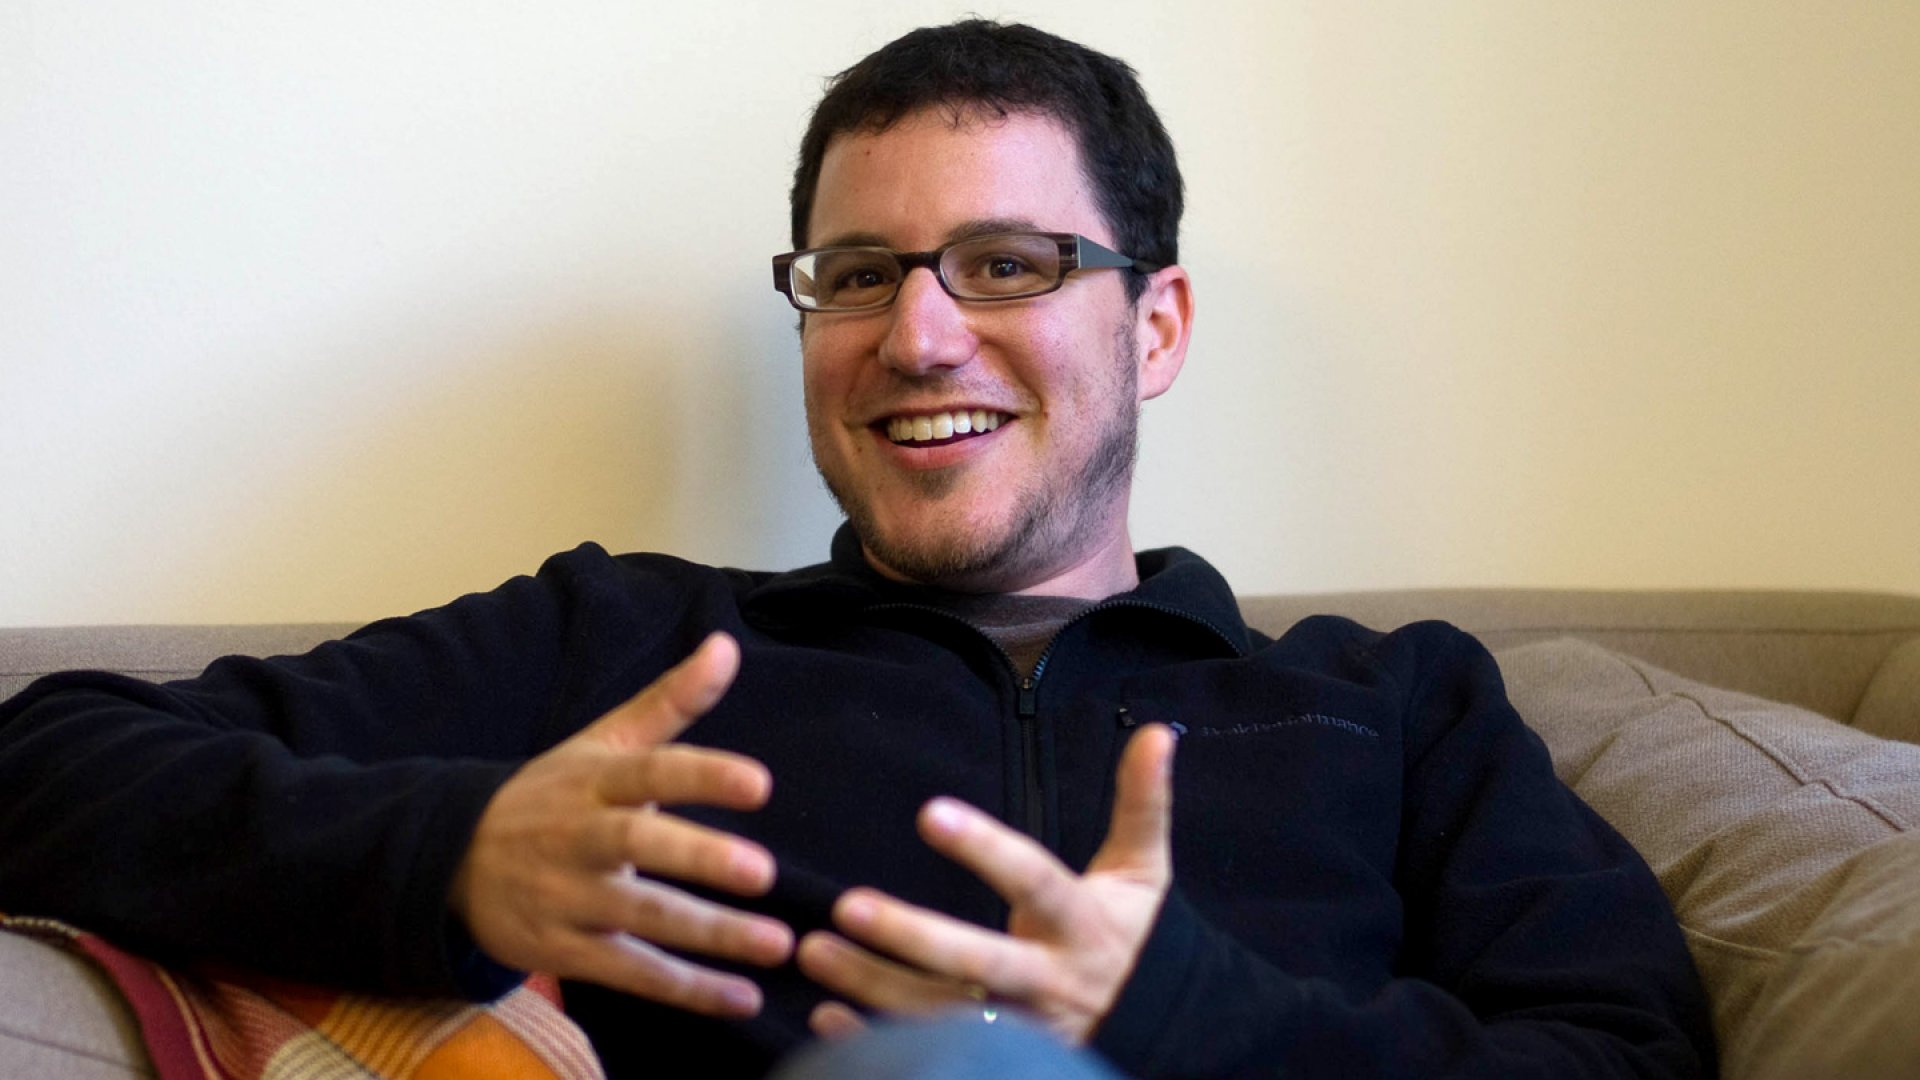 Eric Ries: Whatever You Do, Make the Customer King